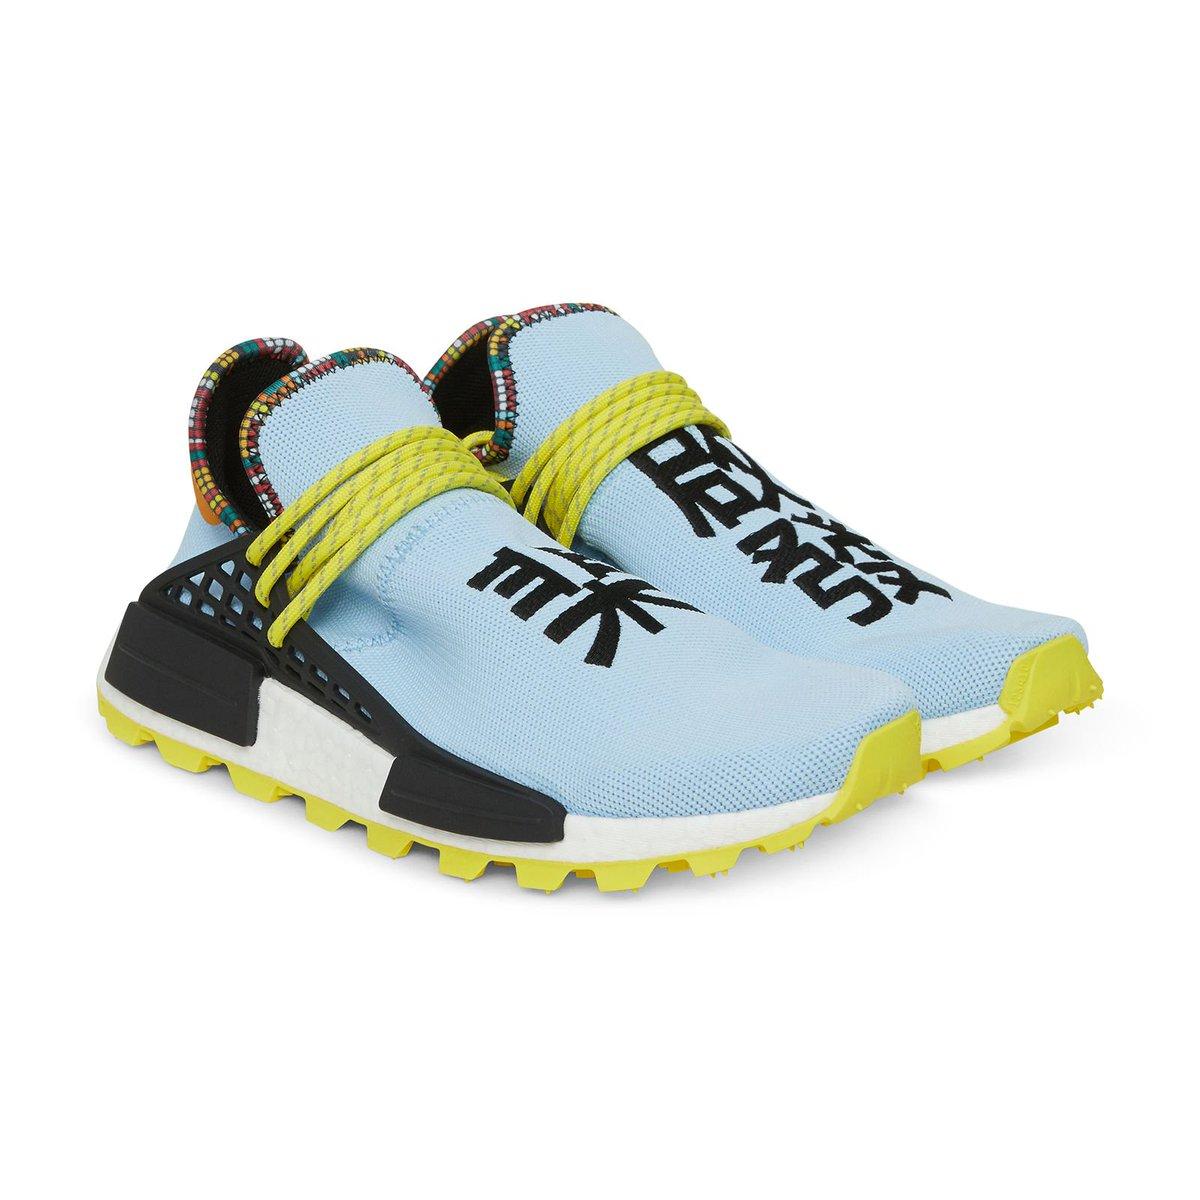 83f6991ca Sneaker Myth on Twitter